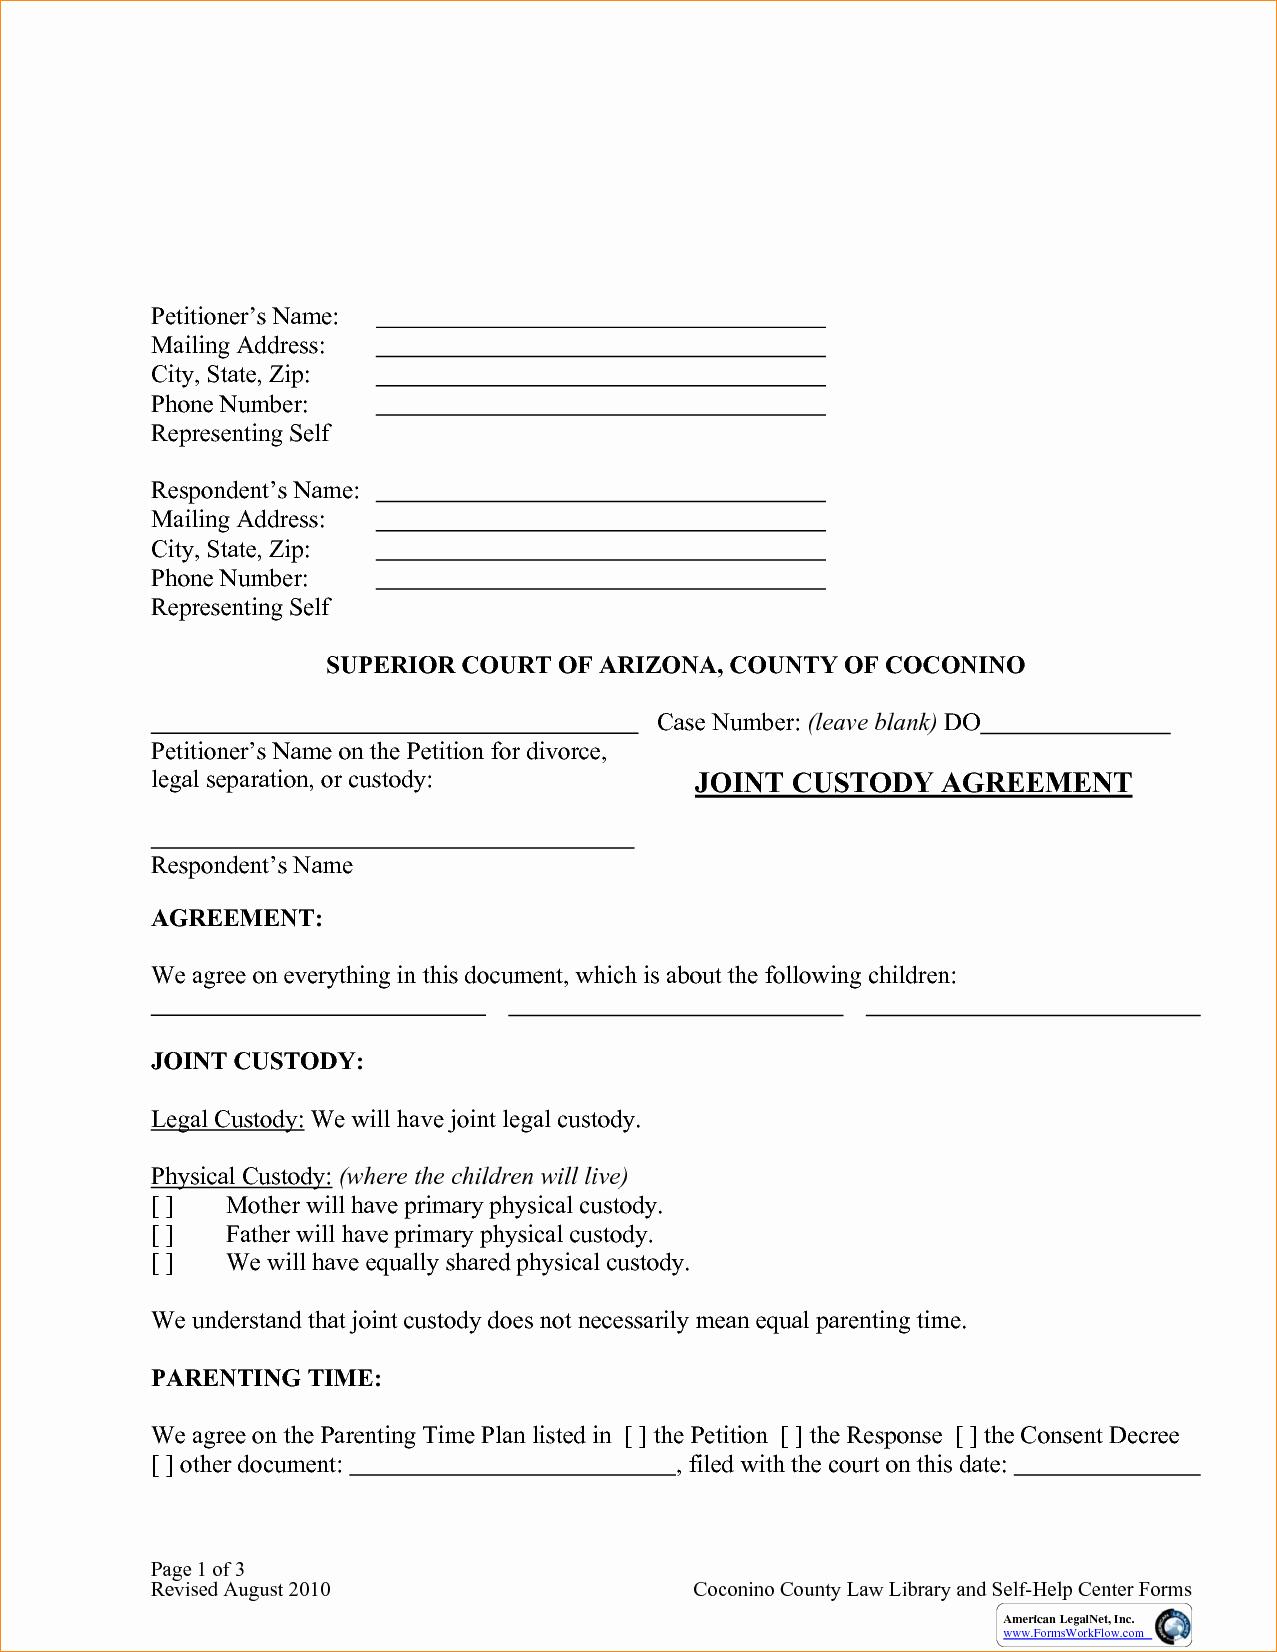 Free Custody Agreement Template Unique Custody Agreement Template